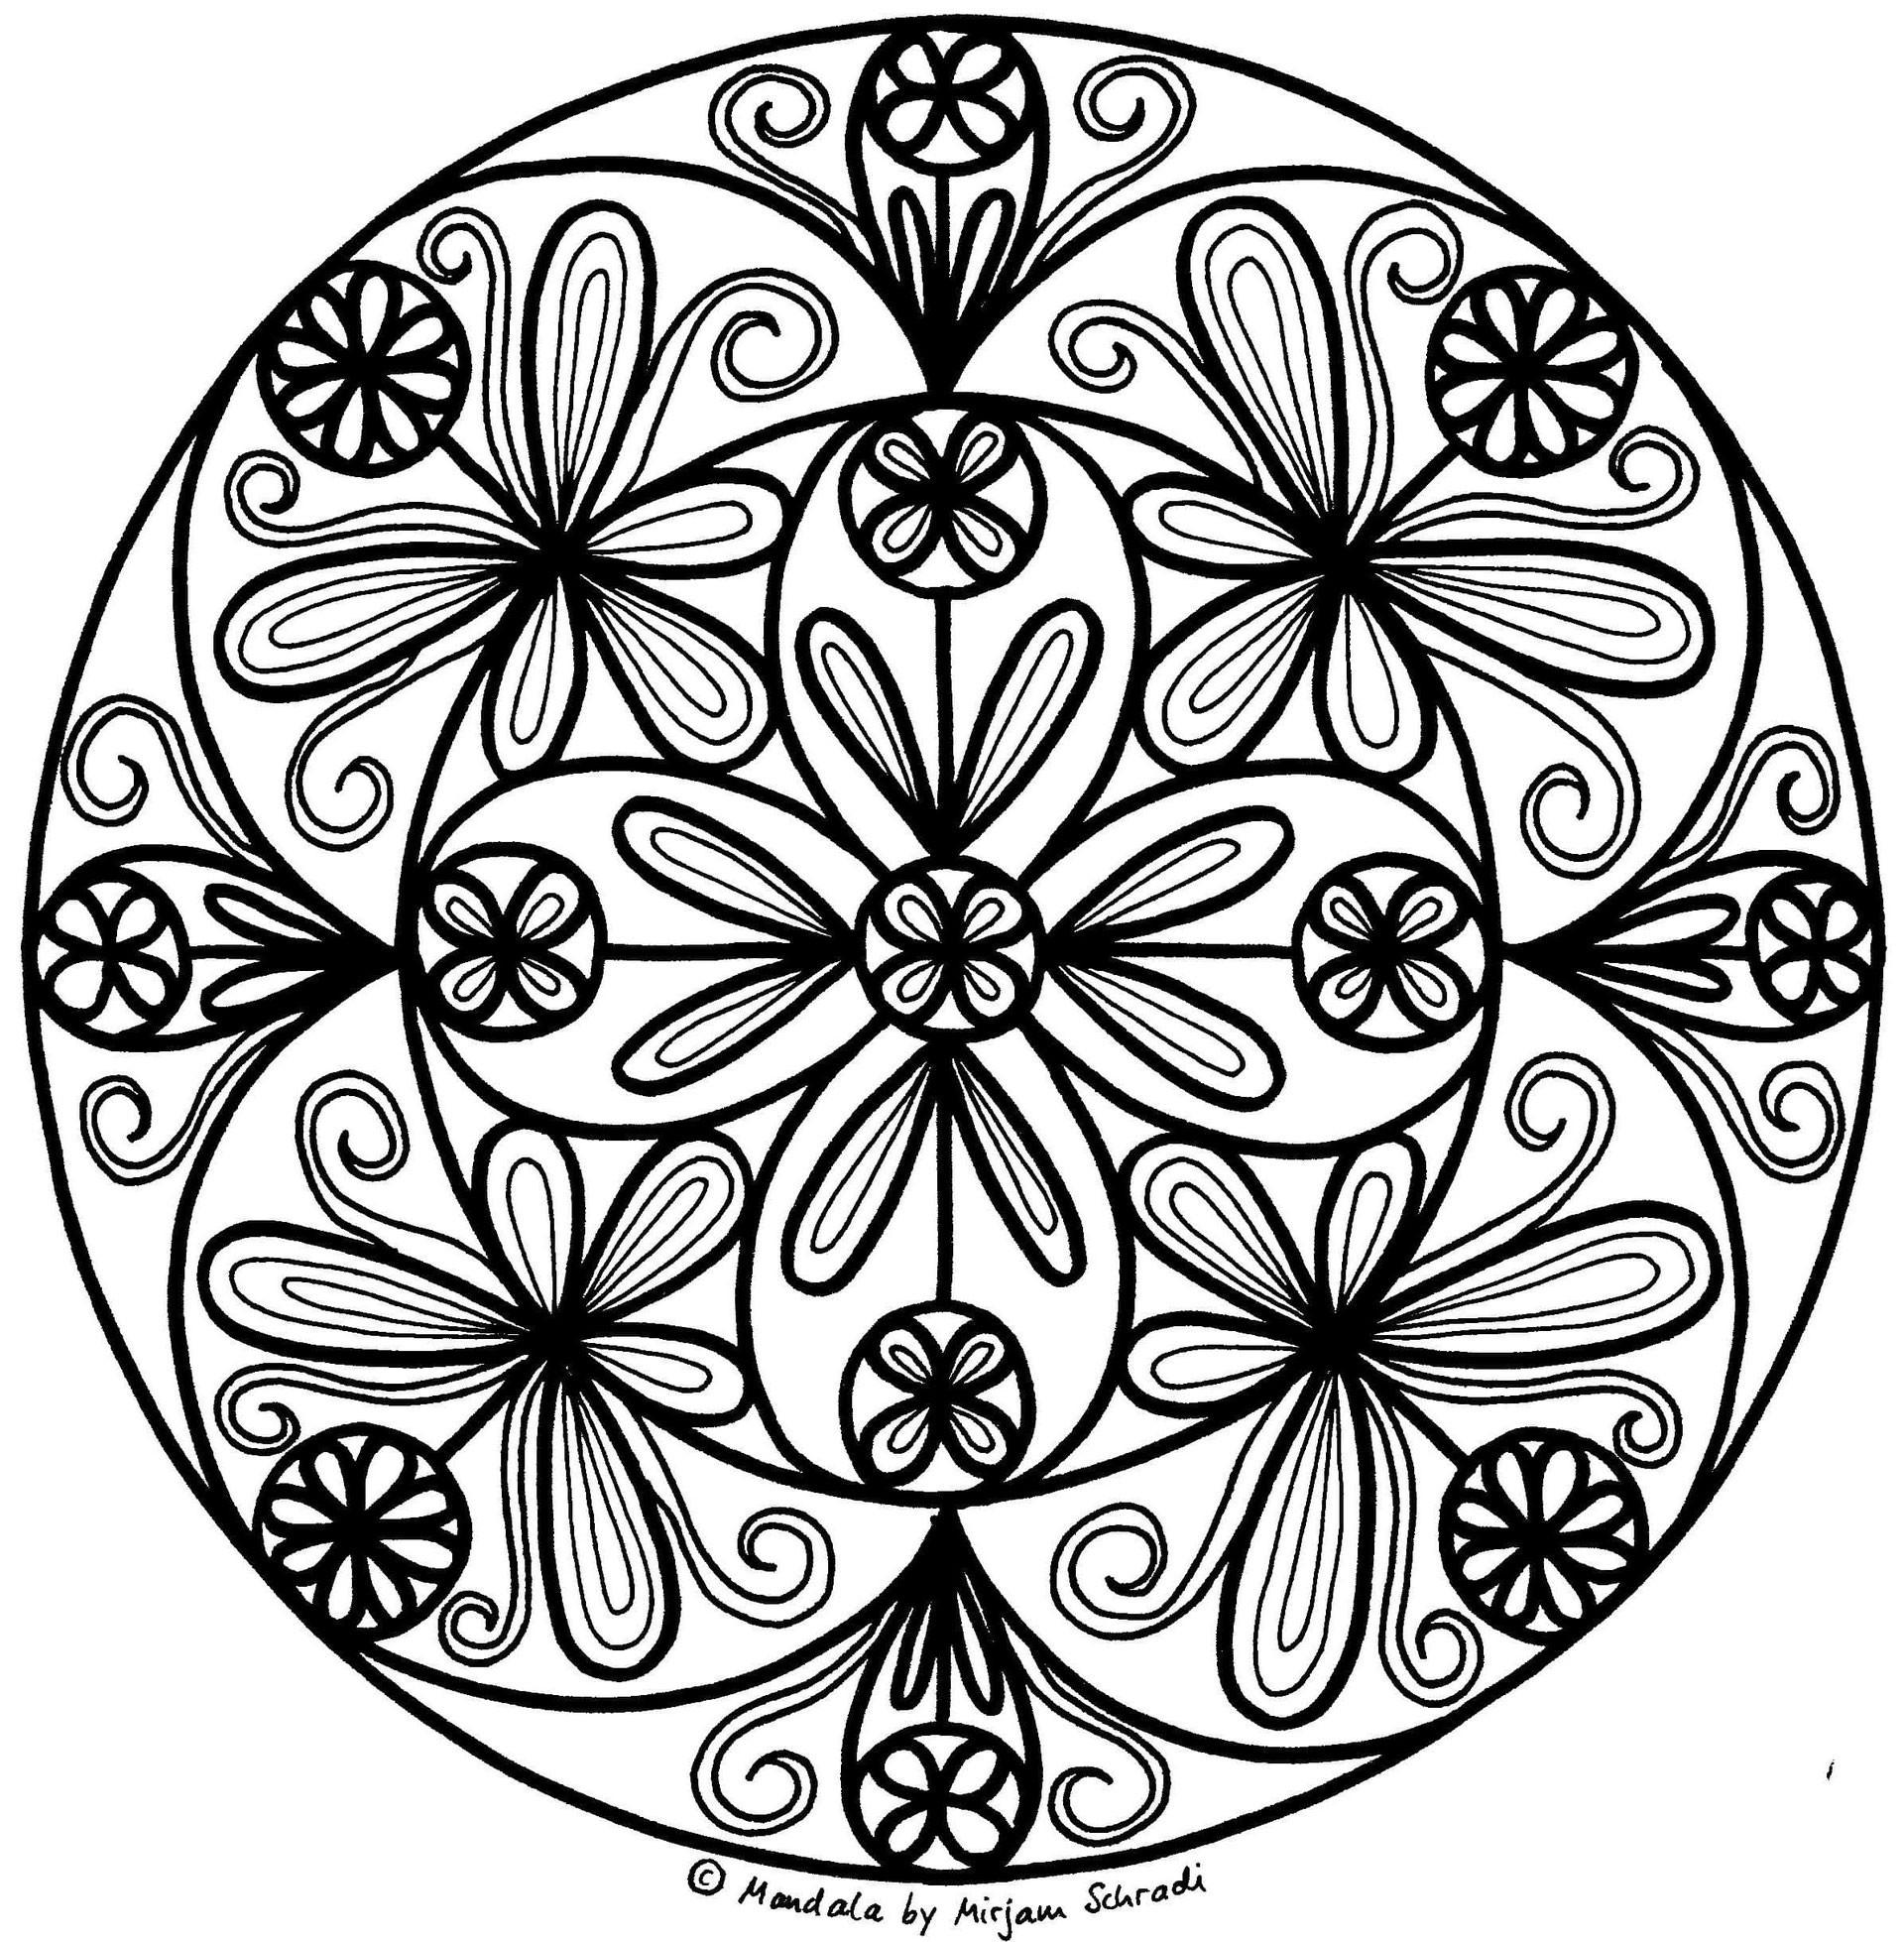 top 20 ausmalbilder mandala blumen - beste wohnkultur